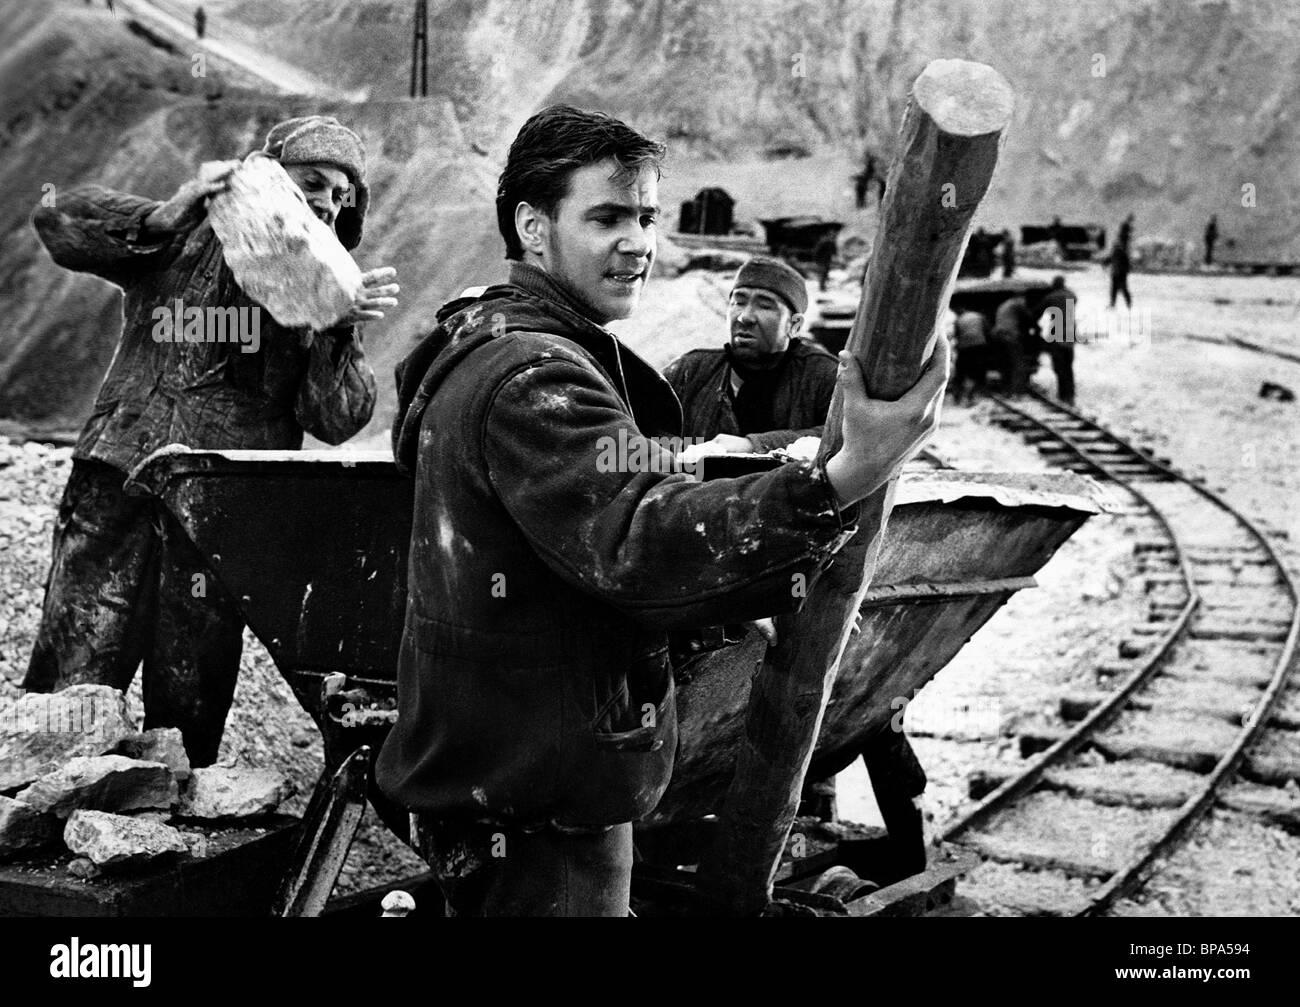 GOTZ GEORGE UNTIL HELL IS FROZEN; DESTINATION DEATH (1961) - Stock Image